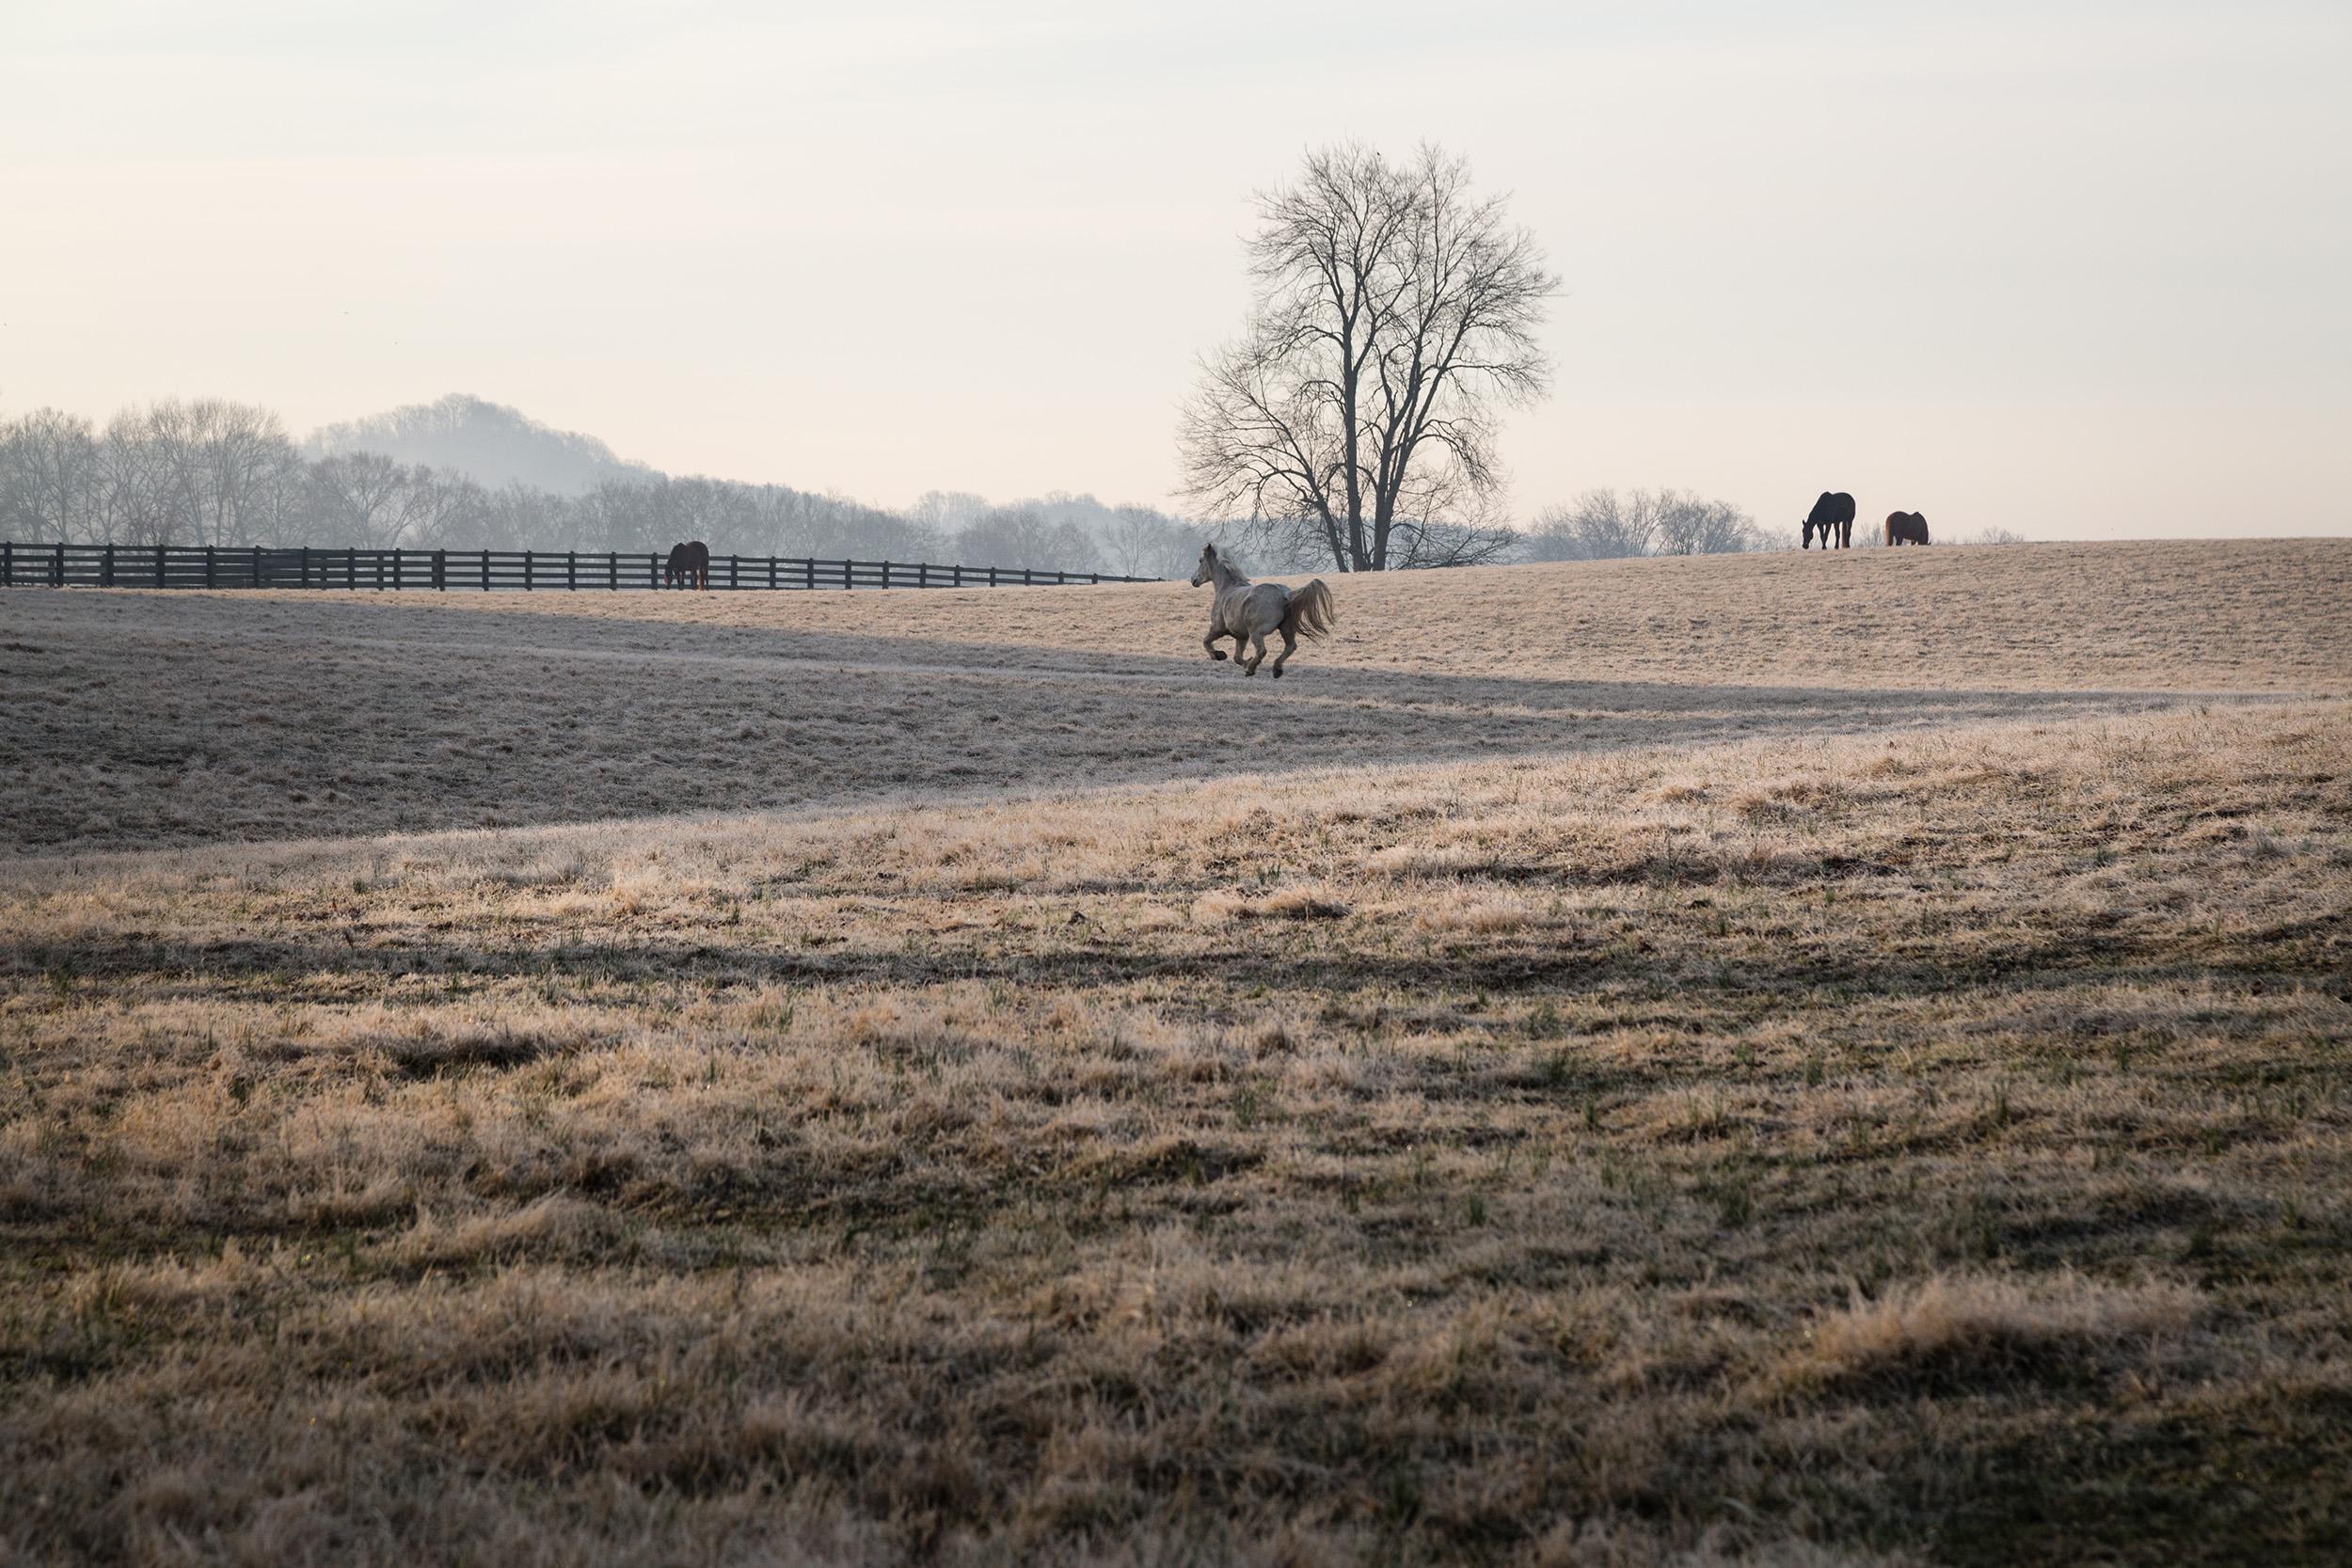 RSmith_HorsesField-1766_2500.jpg